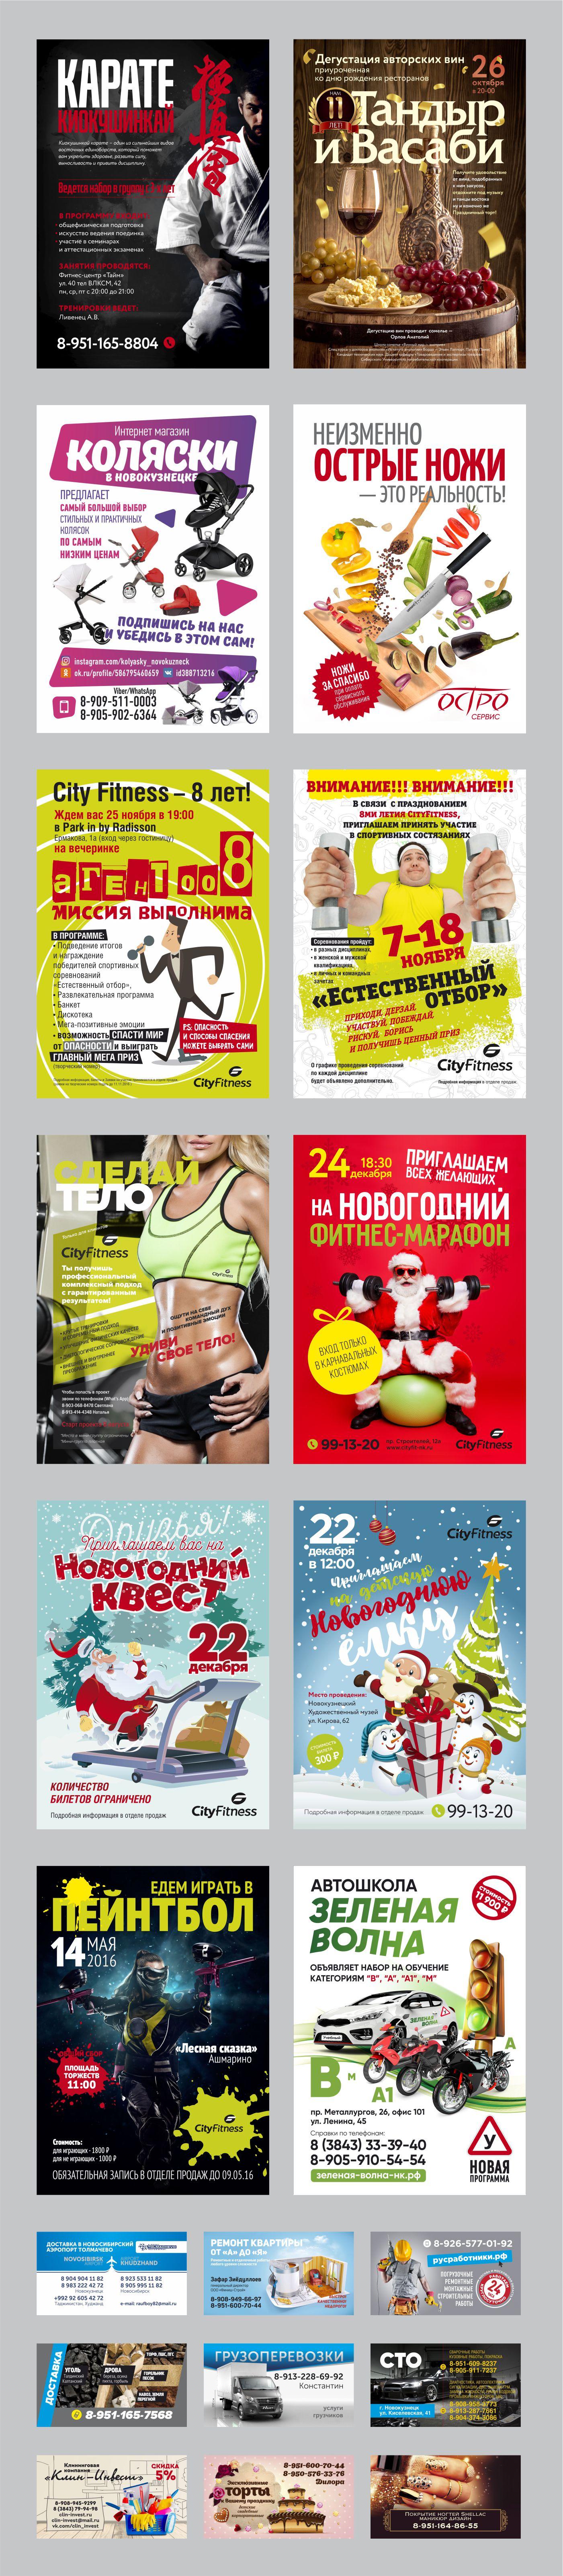 Плакаты, листовки, визитки